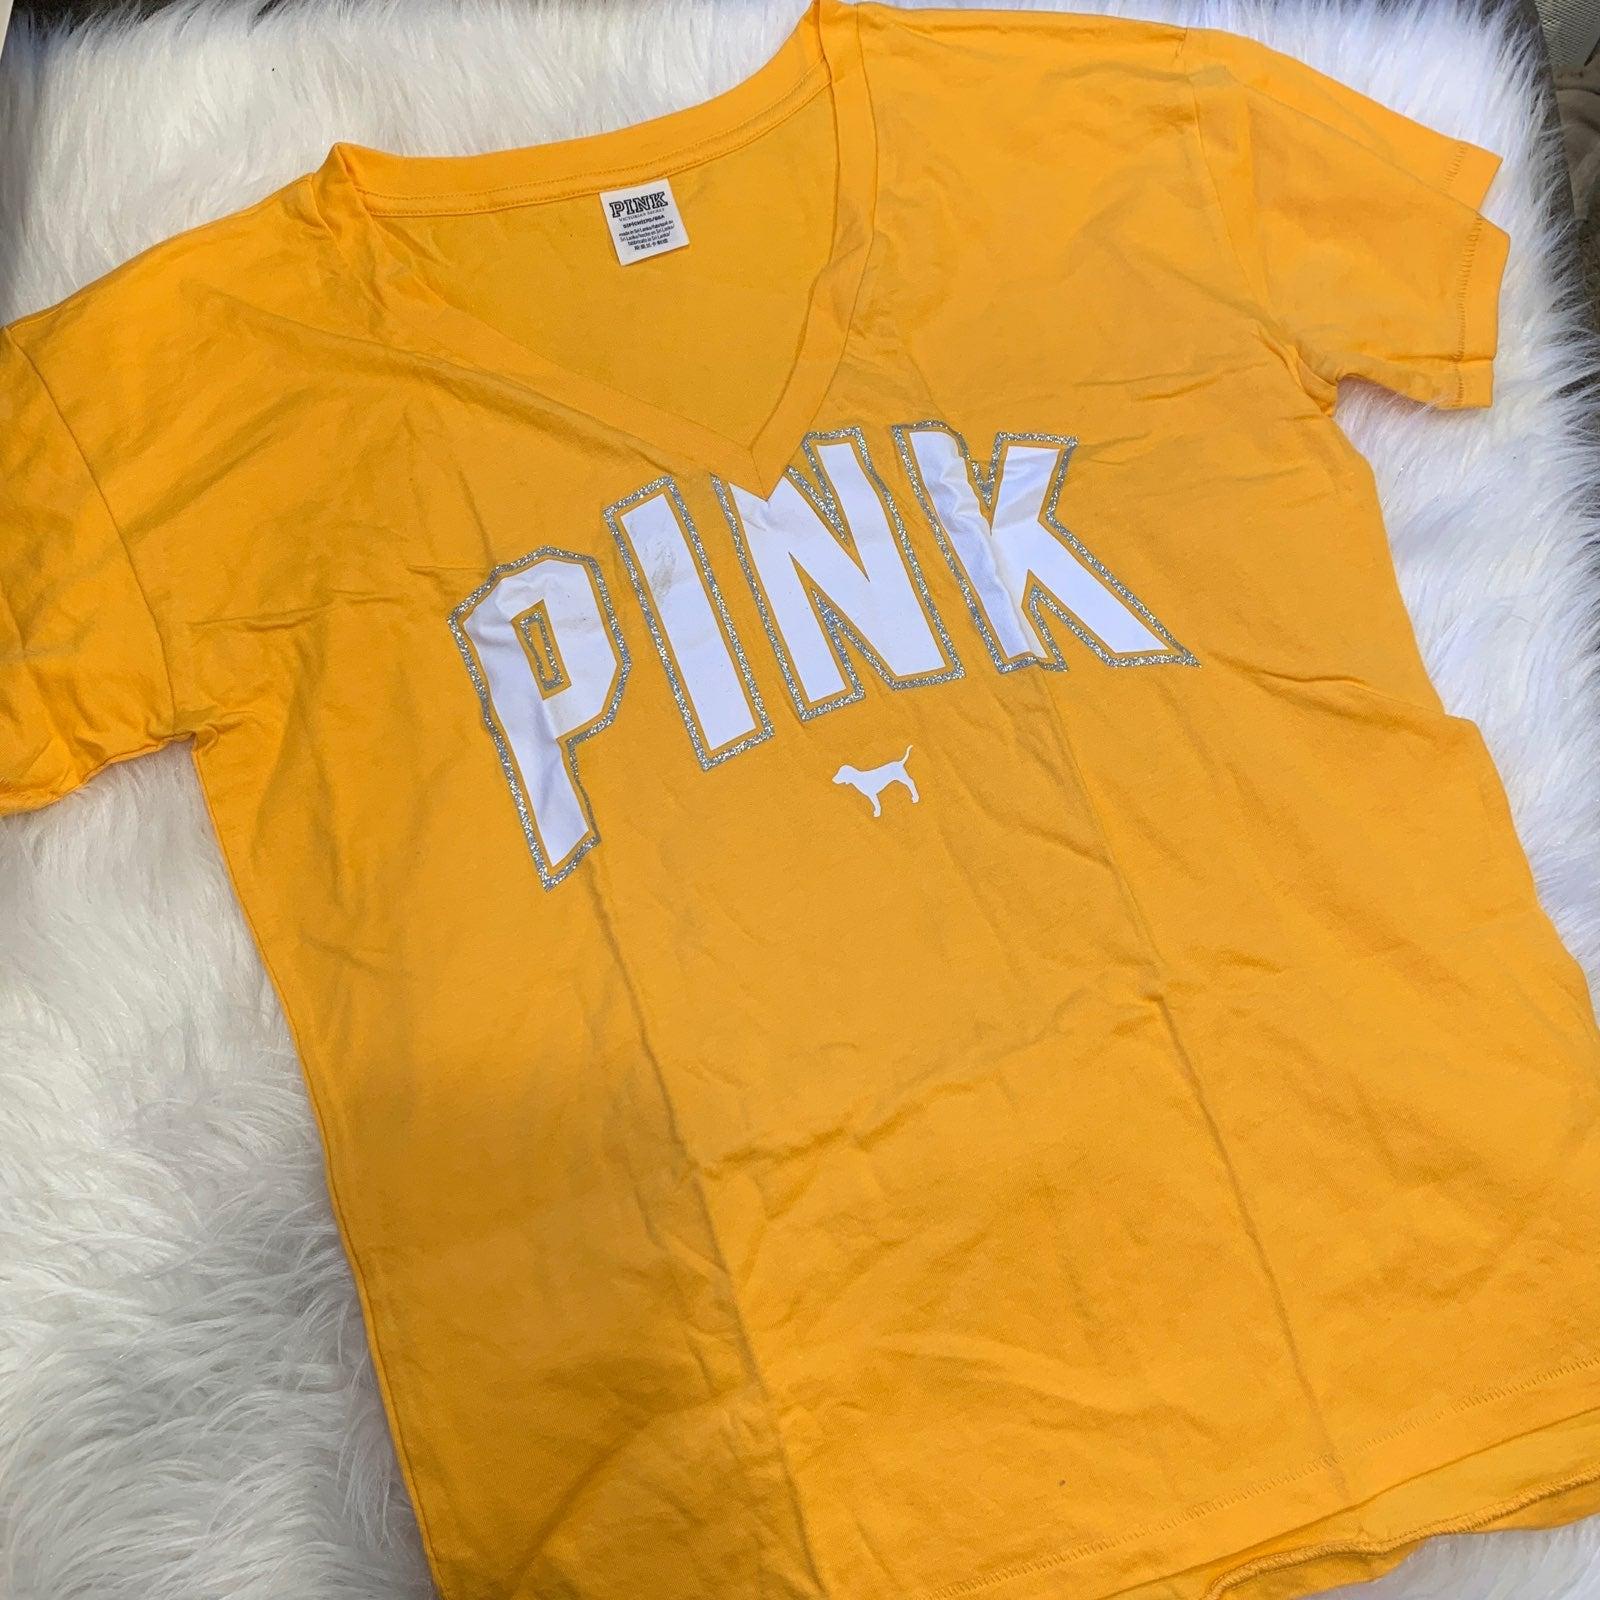 VS Pink V Neck Campus Tee Shirt S